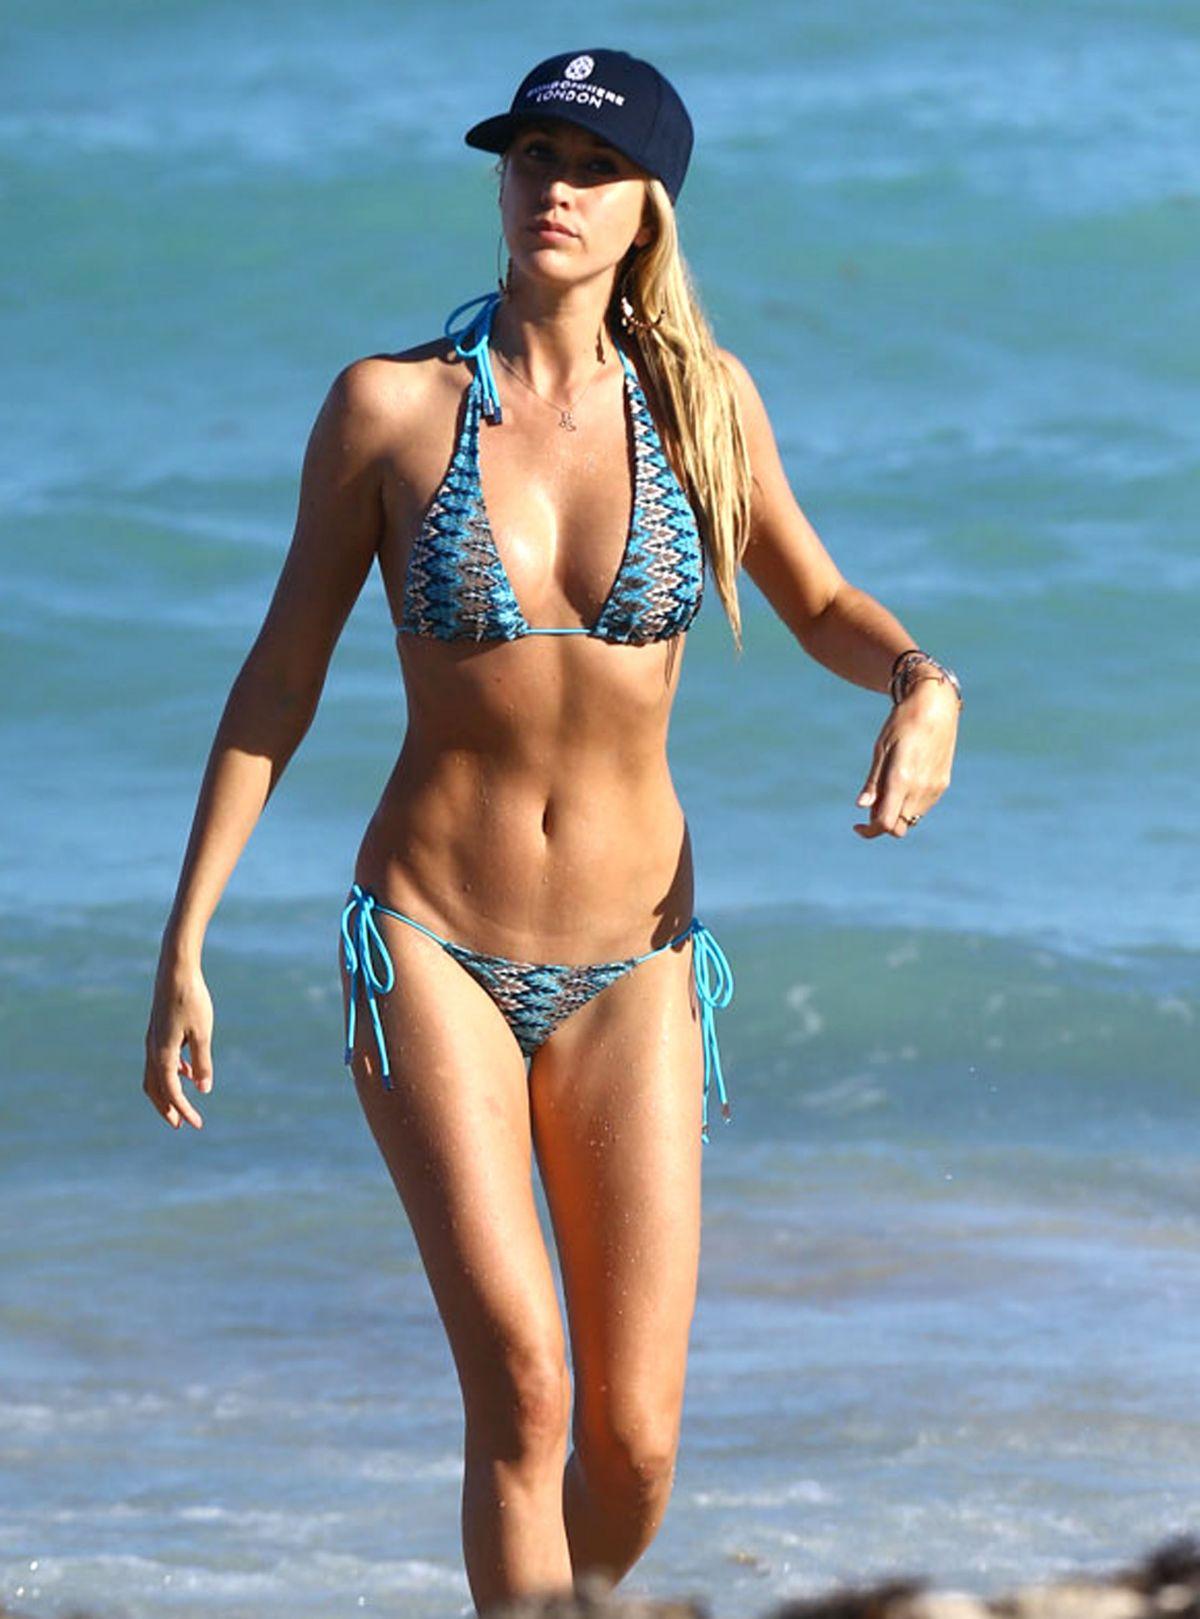 Jennifer Aniston Wearing A Bikini